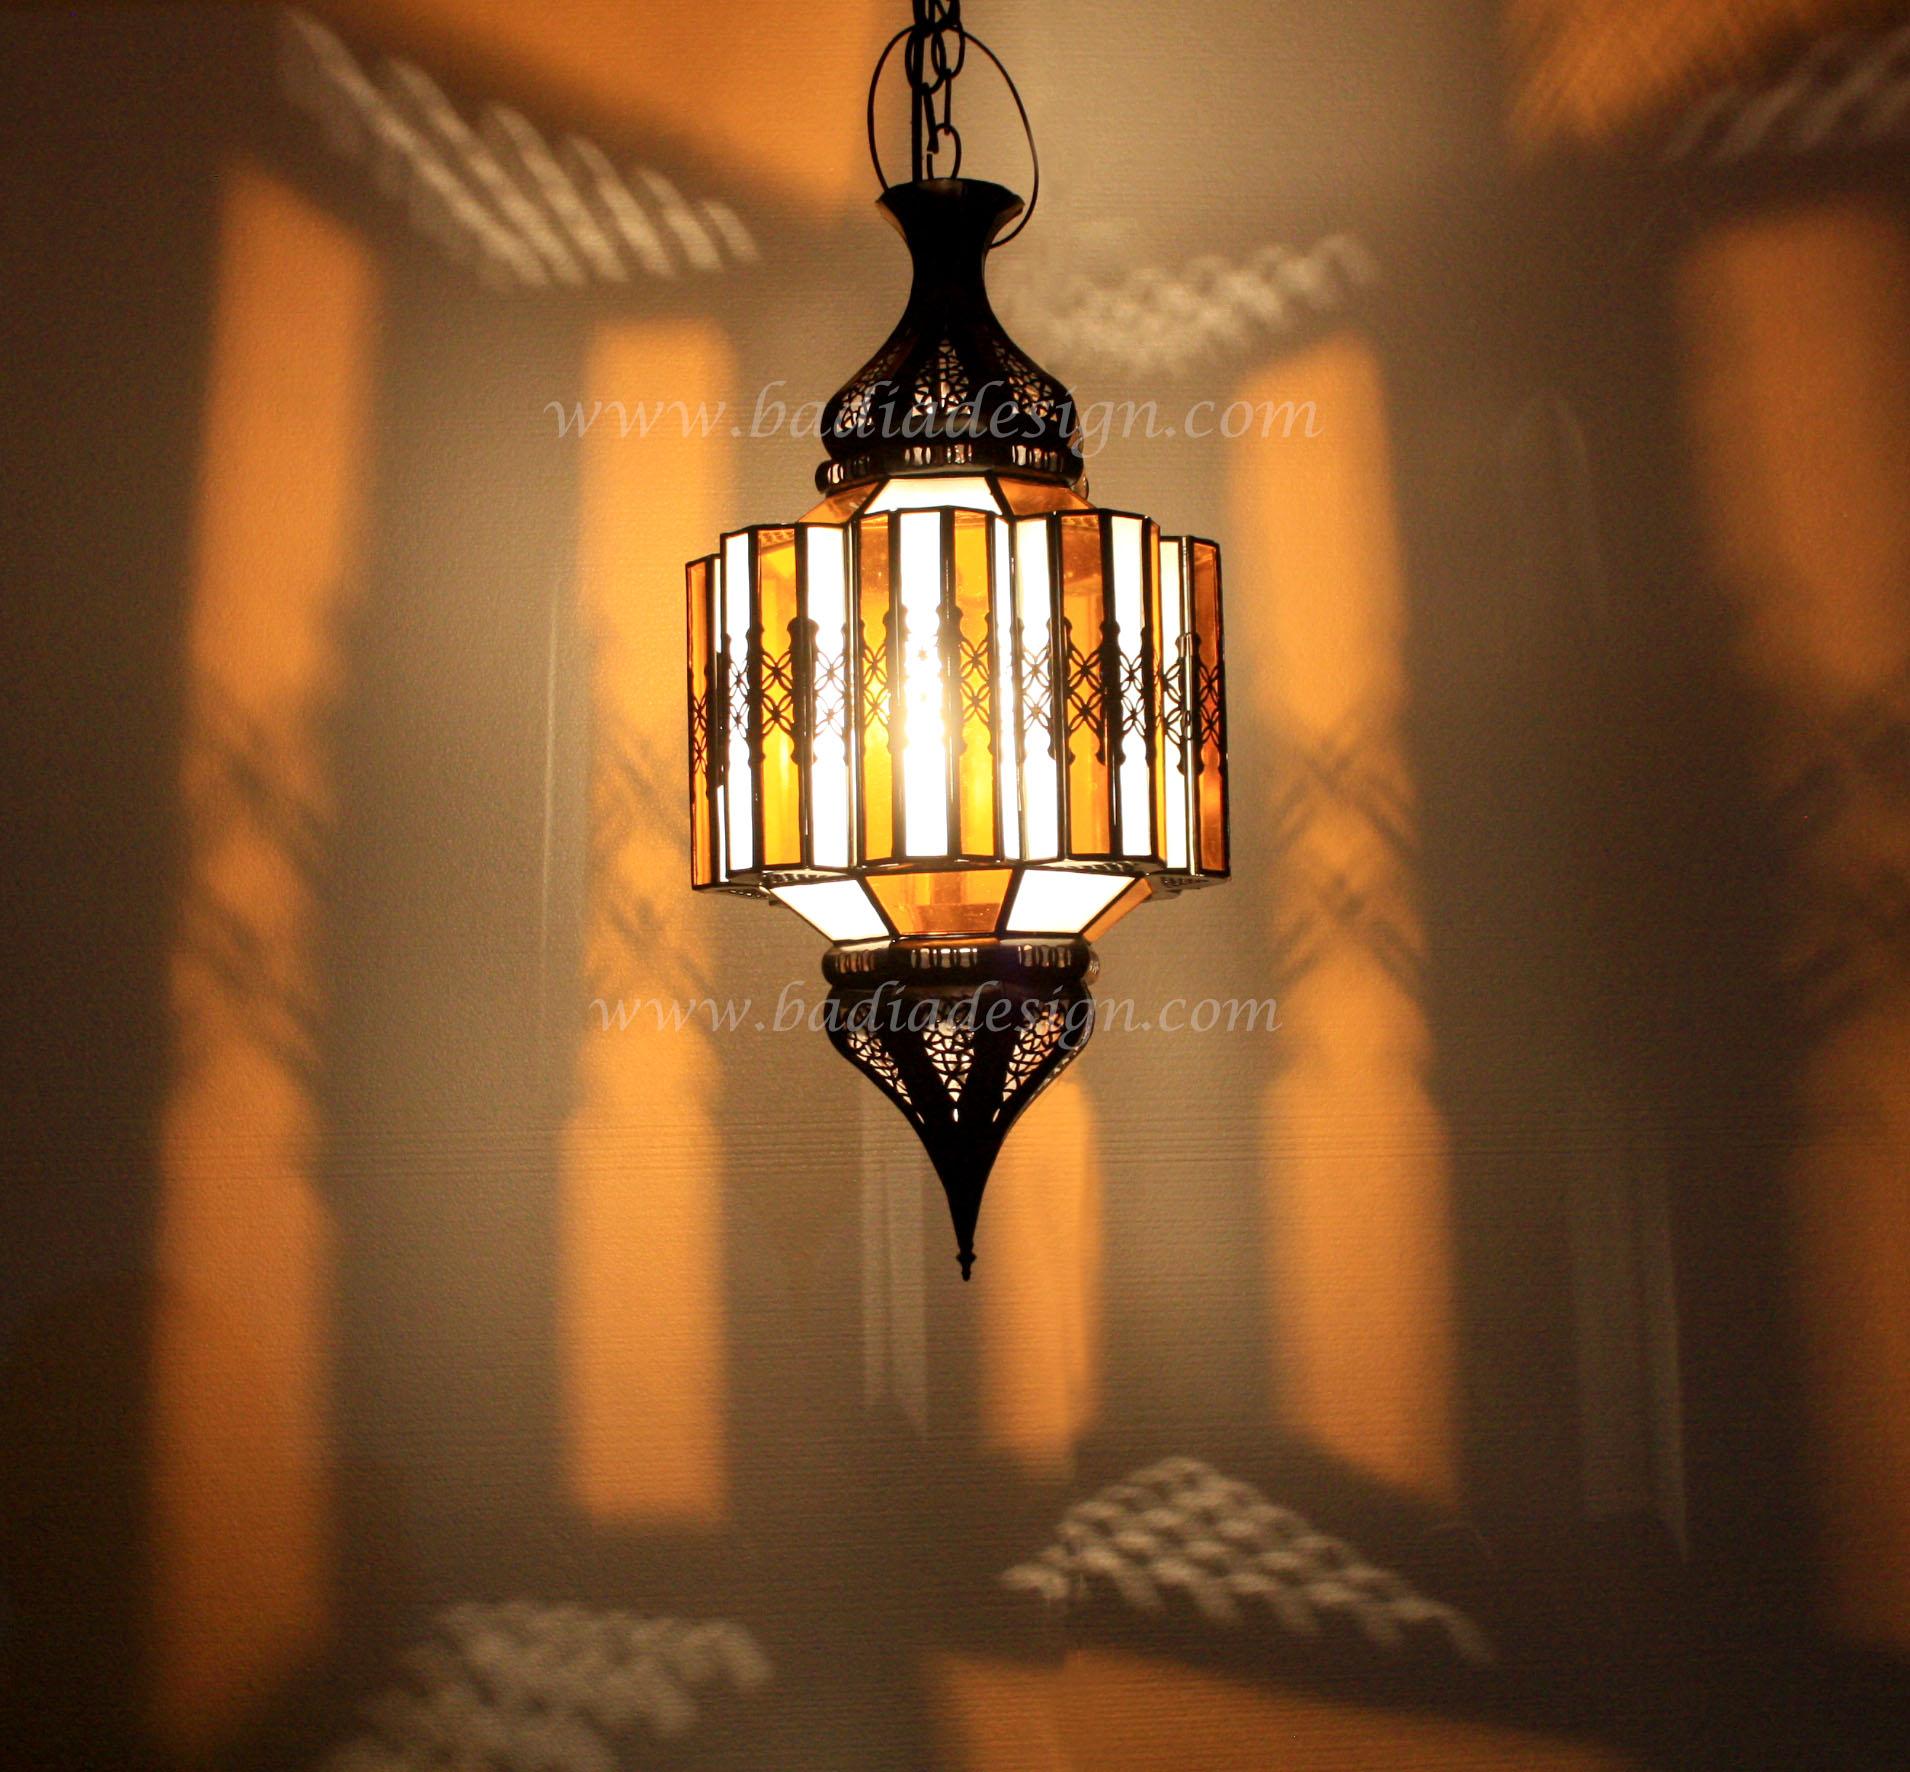 moroccan-lighting-chicago.jpg